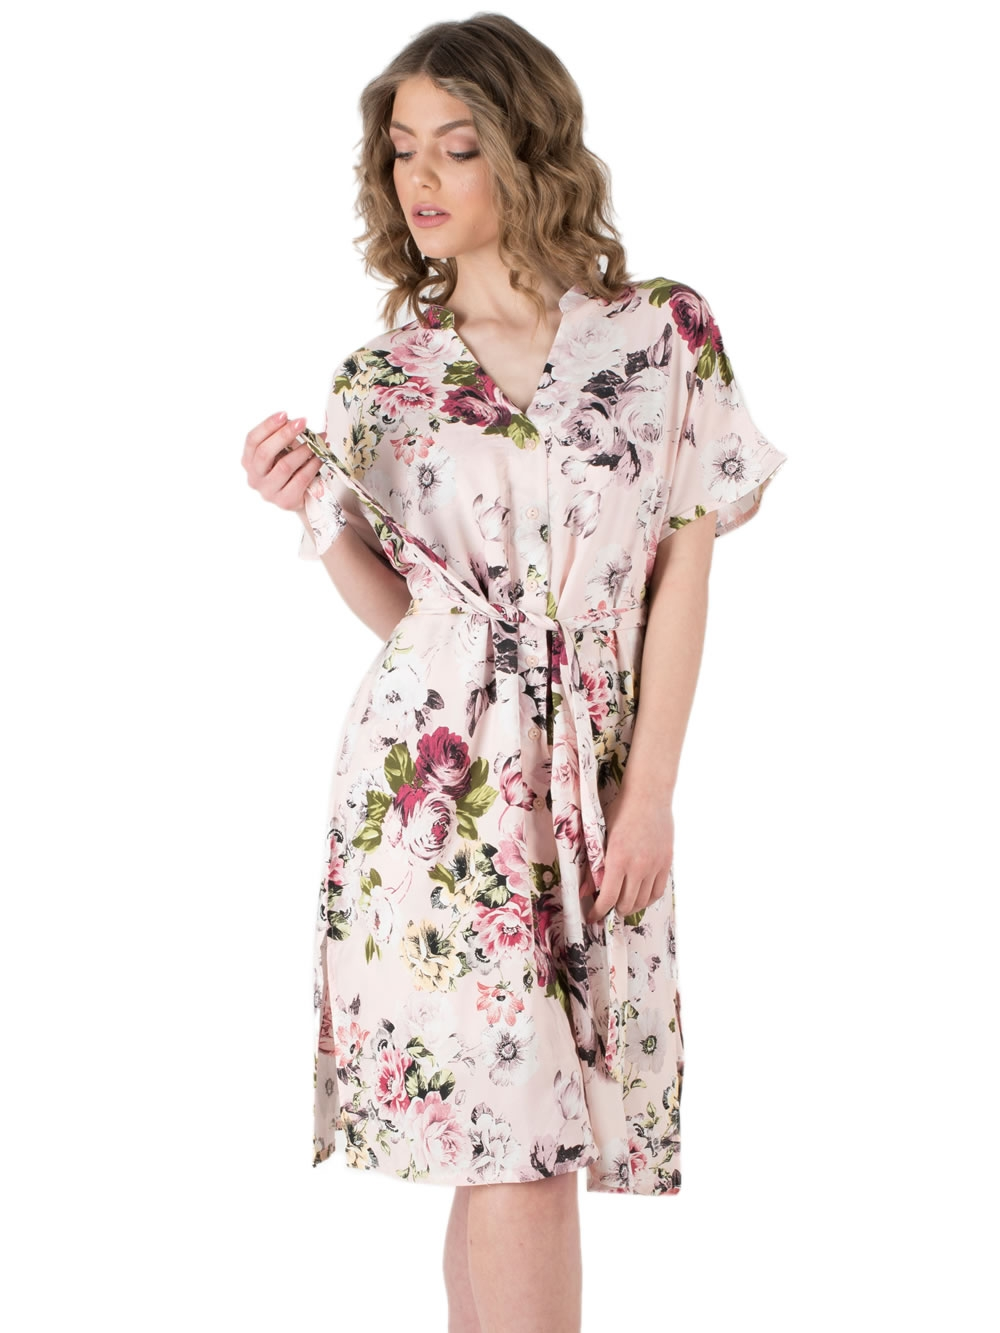 5466a9d1738 Ρόμπα HARMONY - Αέρινο Ύφασμα Σατέν Viscose - Floral Σχέδιο & Κουμπιά -  Καλοκαίρι 2019